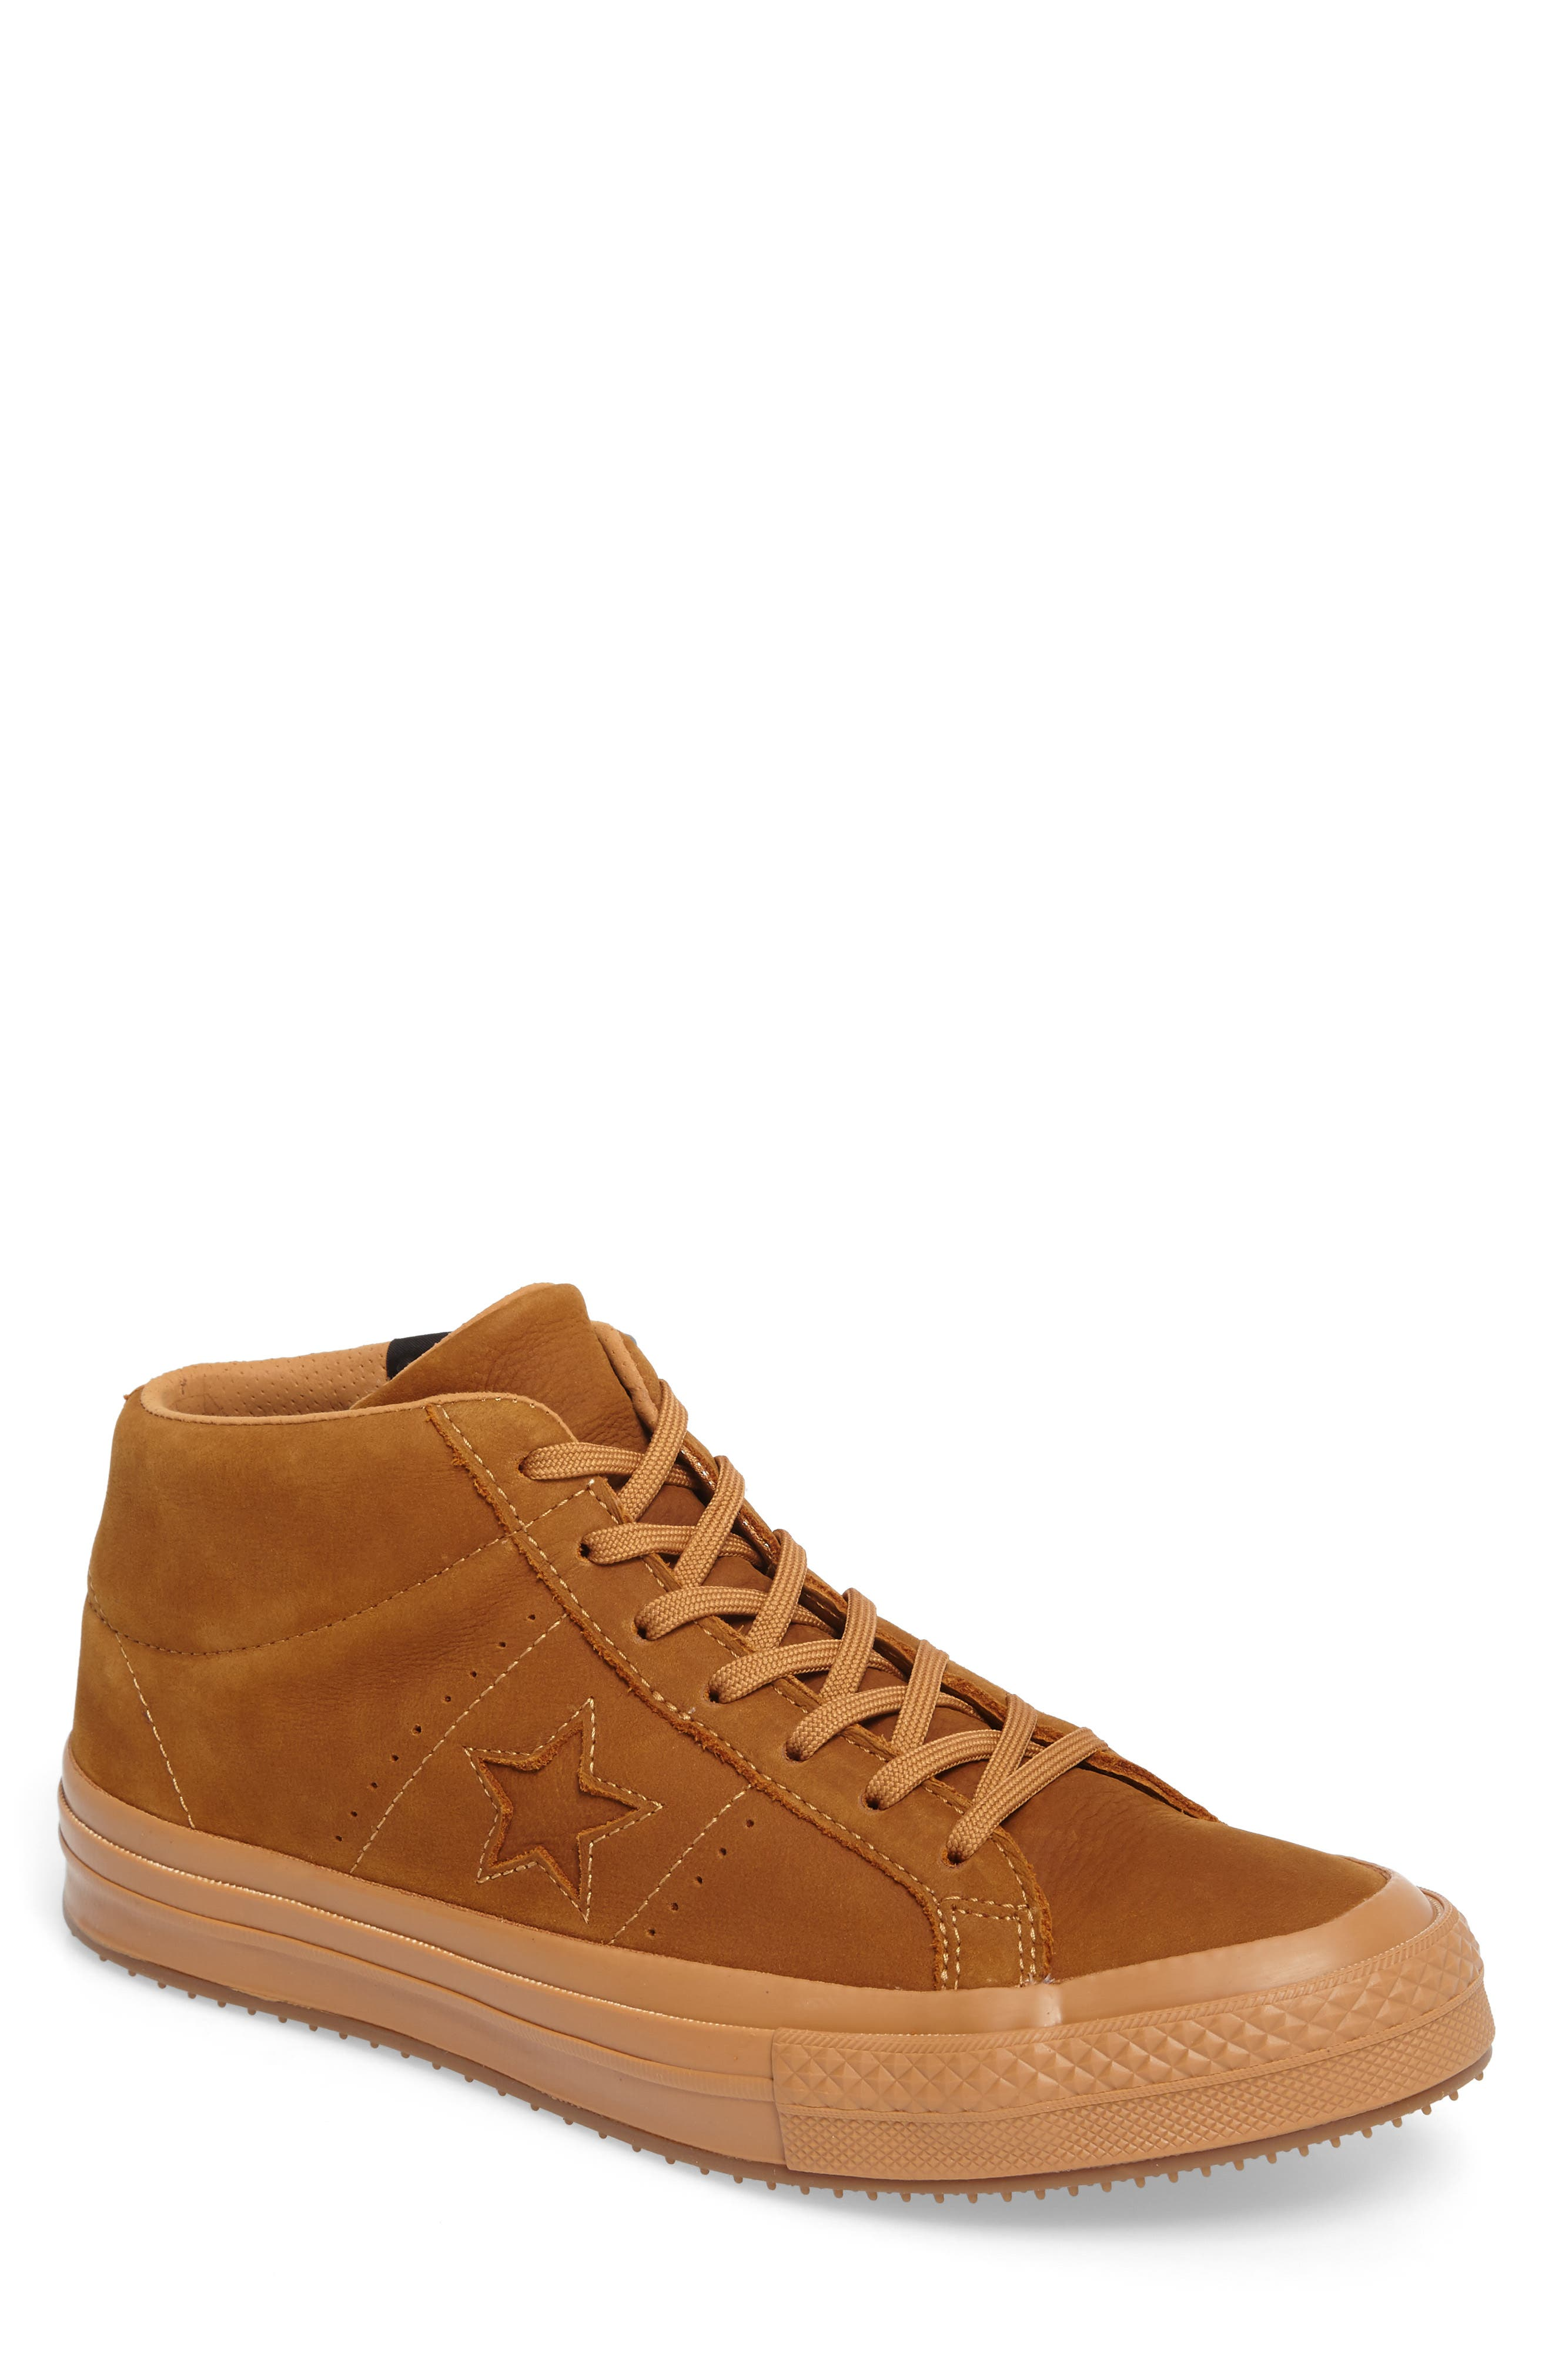 Alternate Image 1 Selected - Converse One Star Mid Sneaker (Men)